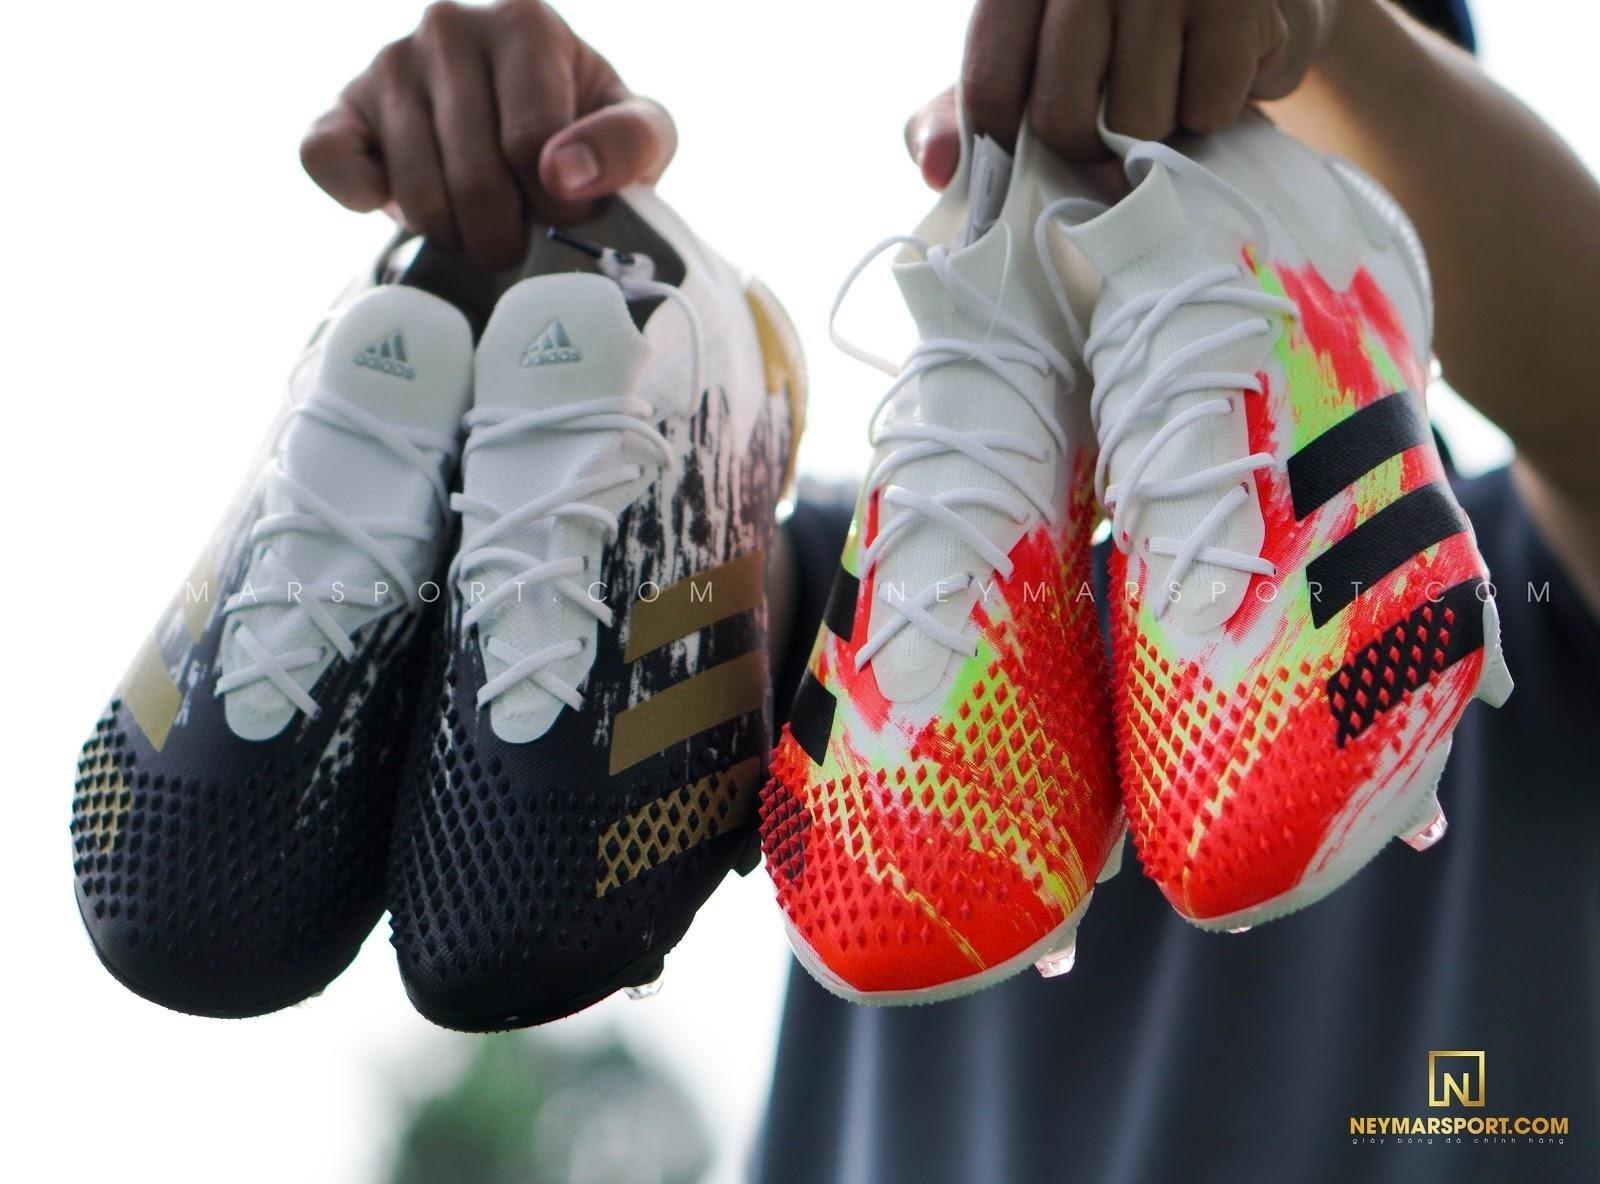 Giày đá bóng Adidas Predator 20.1 FG/AG Uniforia